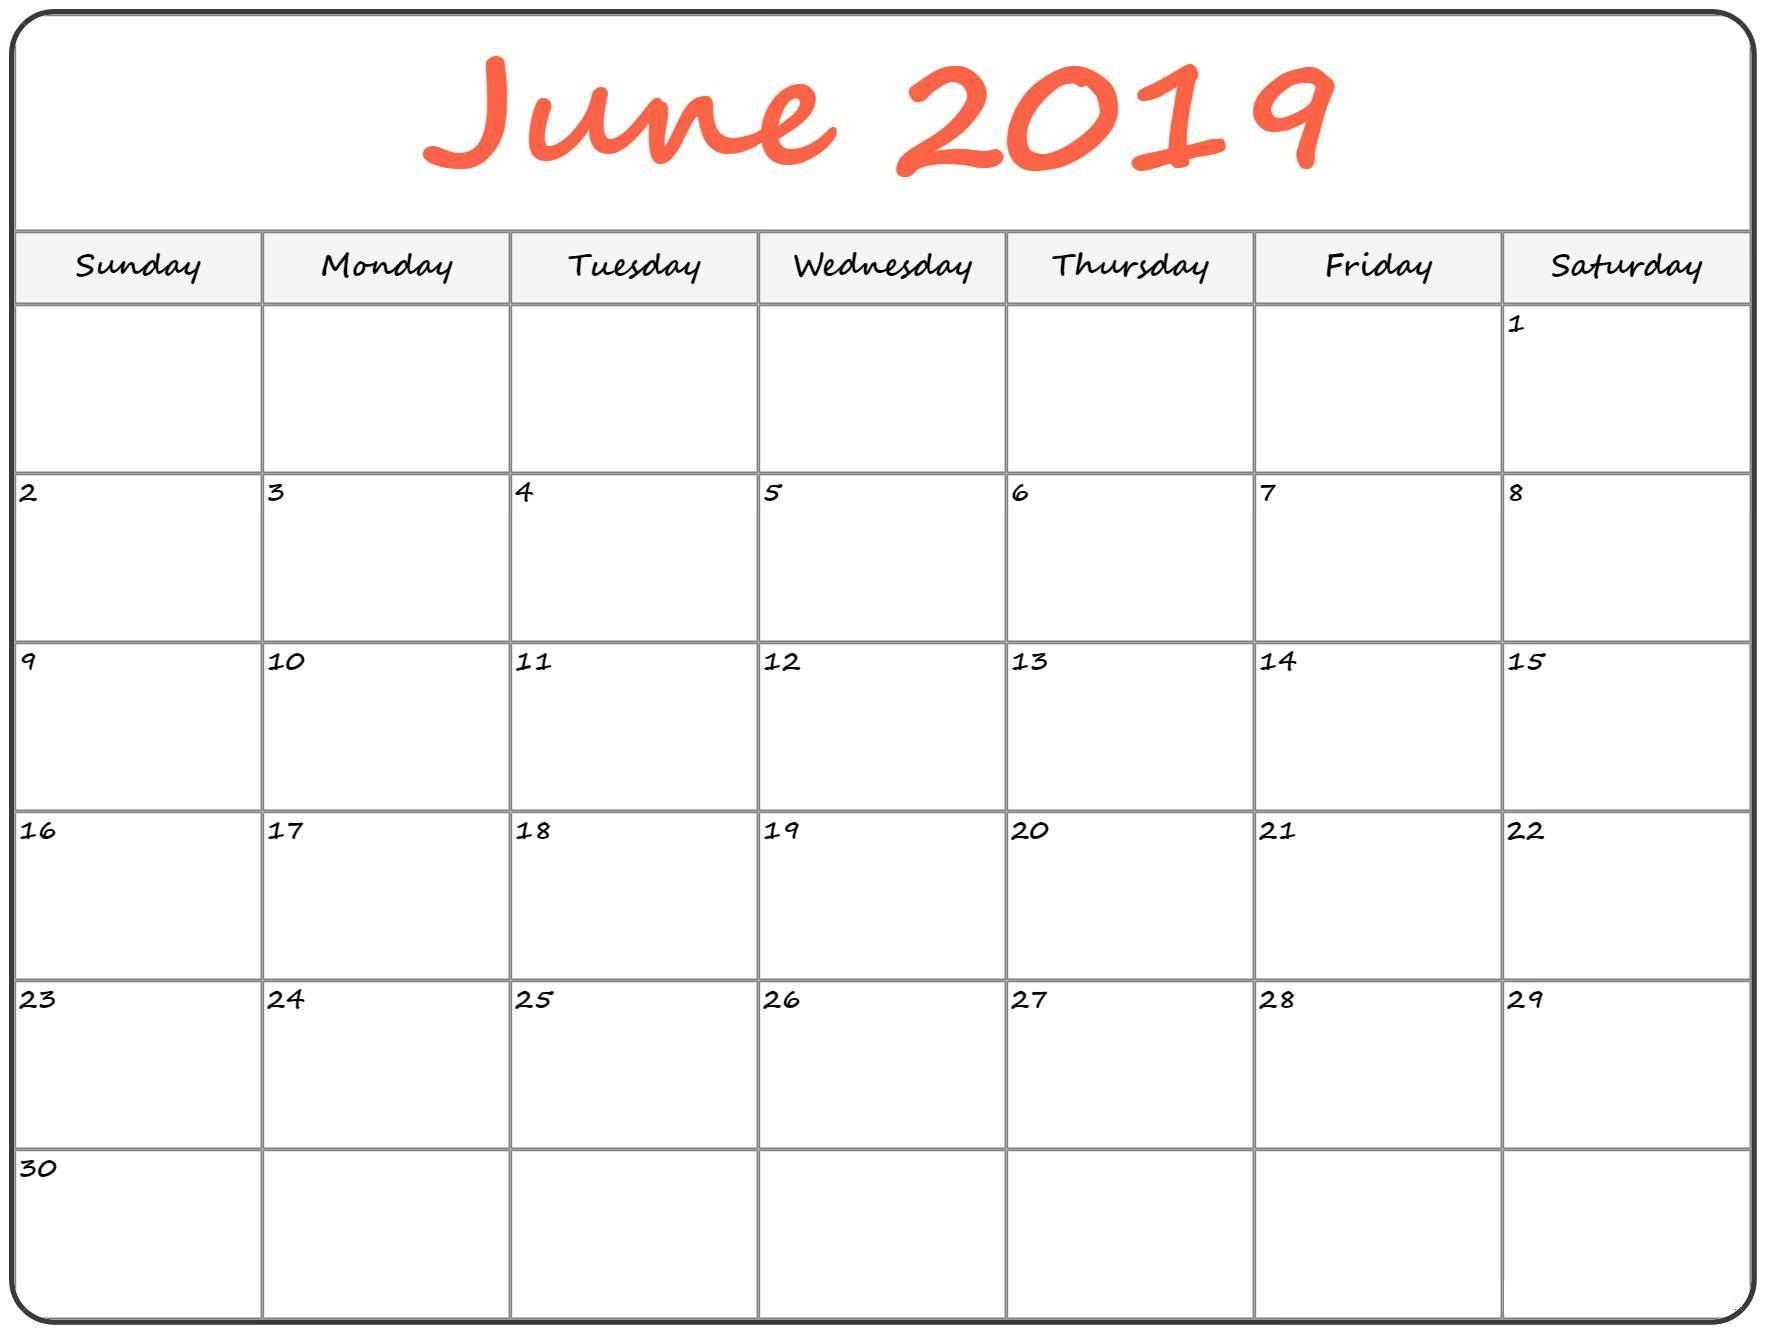 June 2019 Holidays Calendar | Blank June 2019 Calendar Printable throughout June Calendar Printable Template